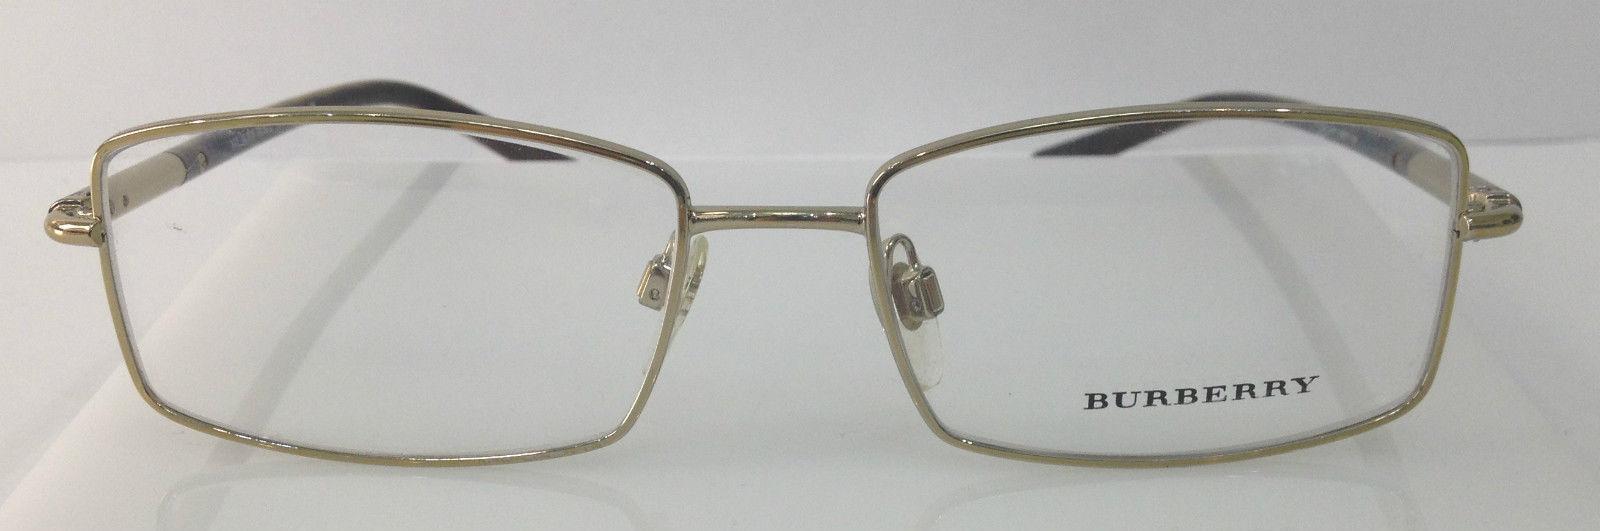 Burberry Glasses Frame Parts : BURBERRY B 1239 COL 1145 GOLD W/TORTOISE METAL EYEGLASSES ...